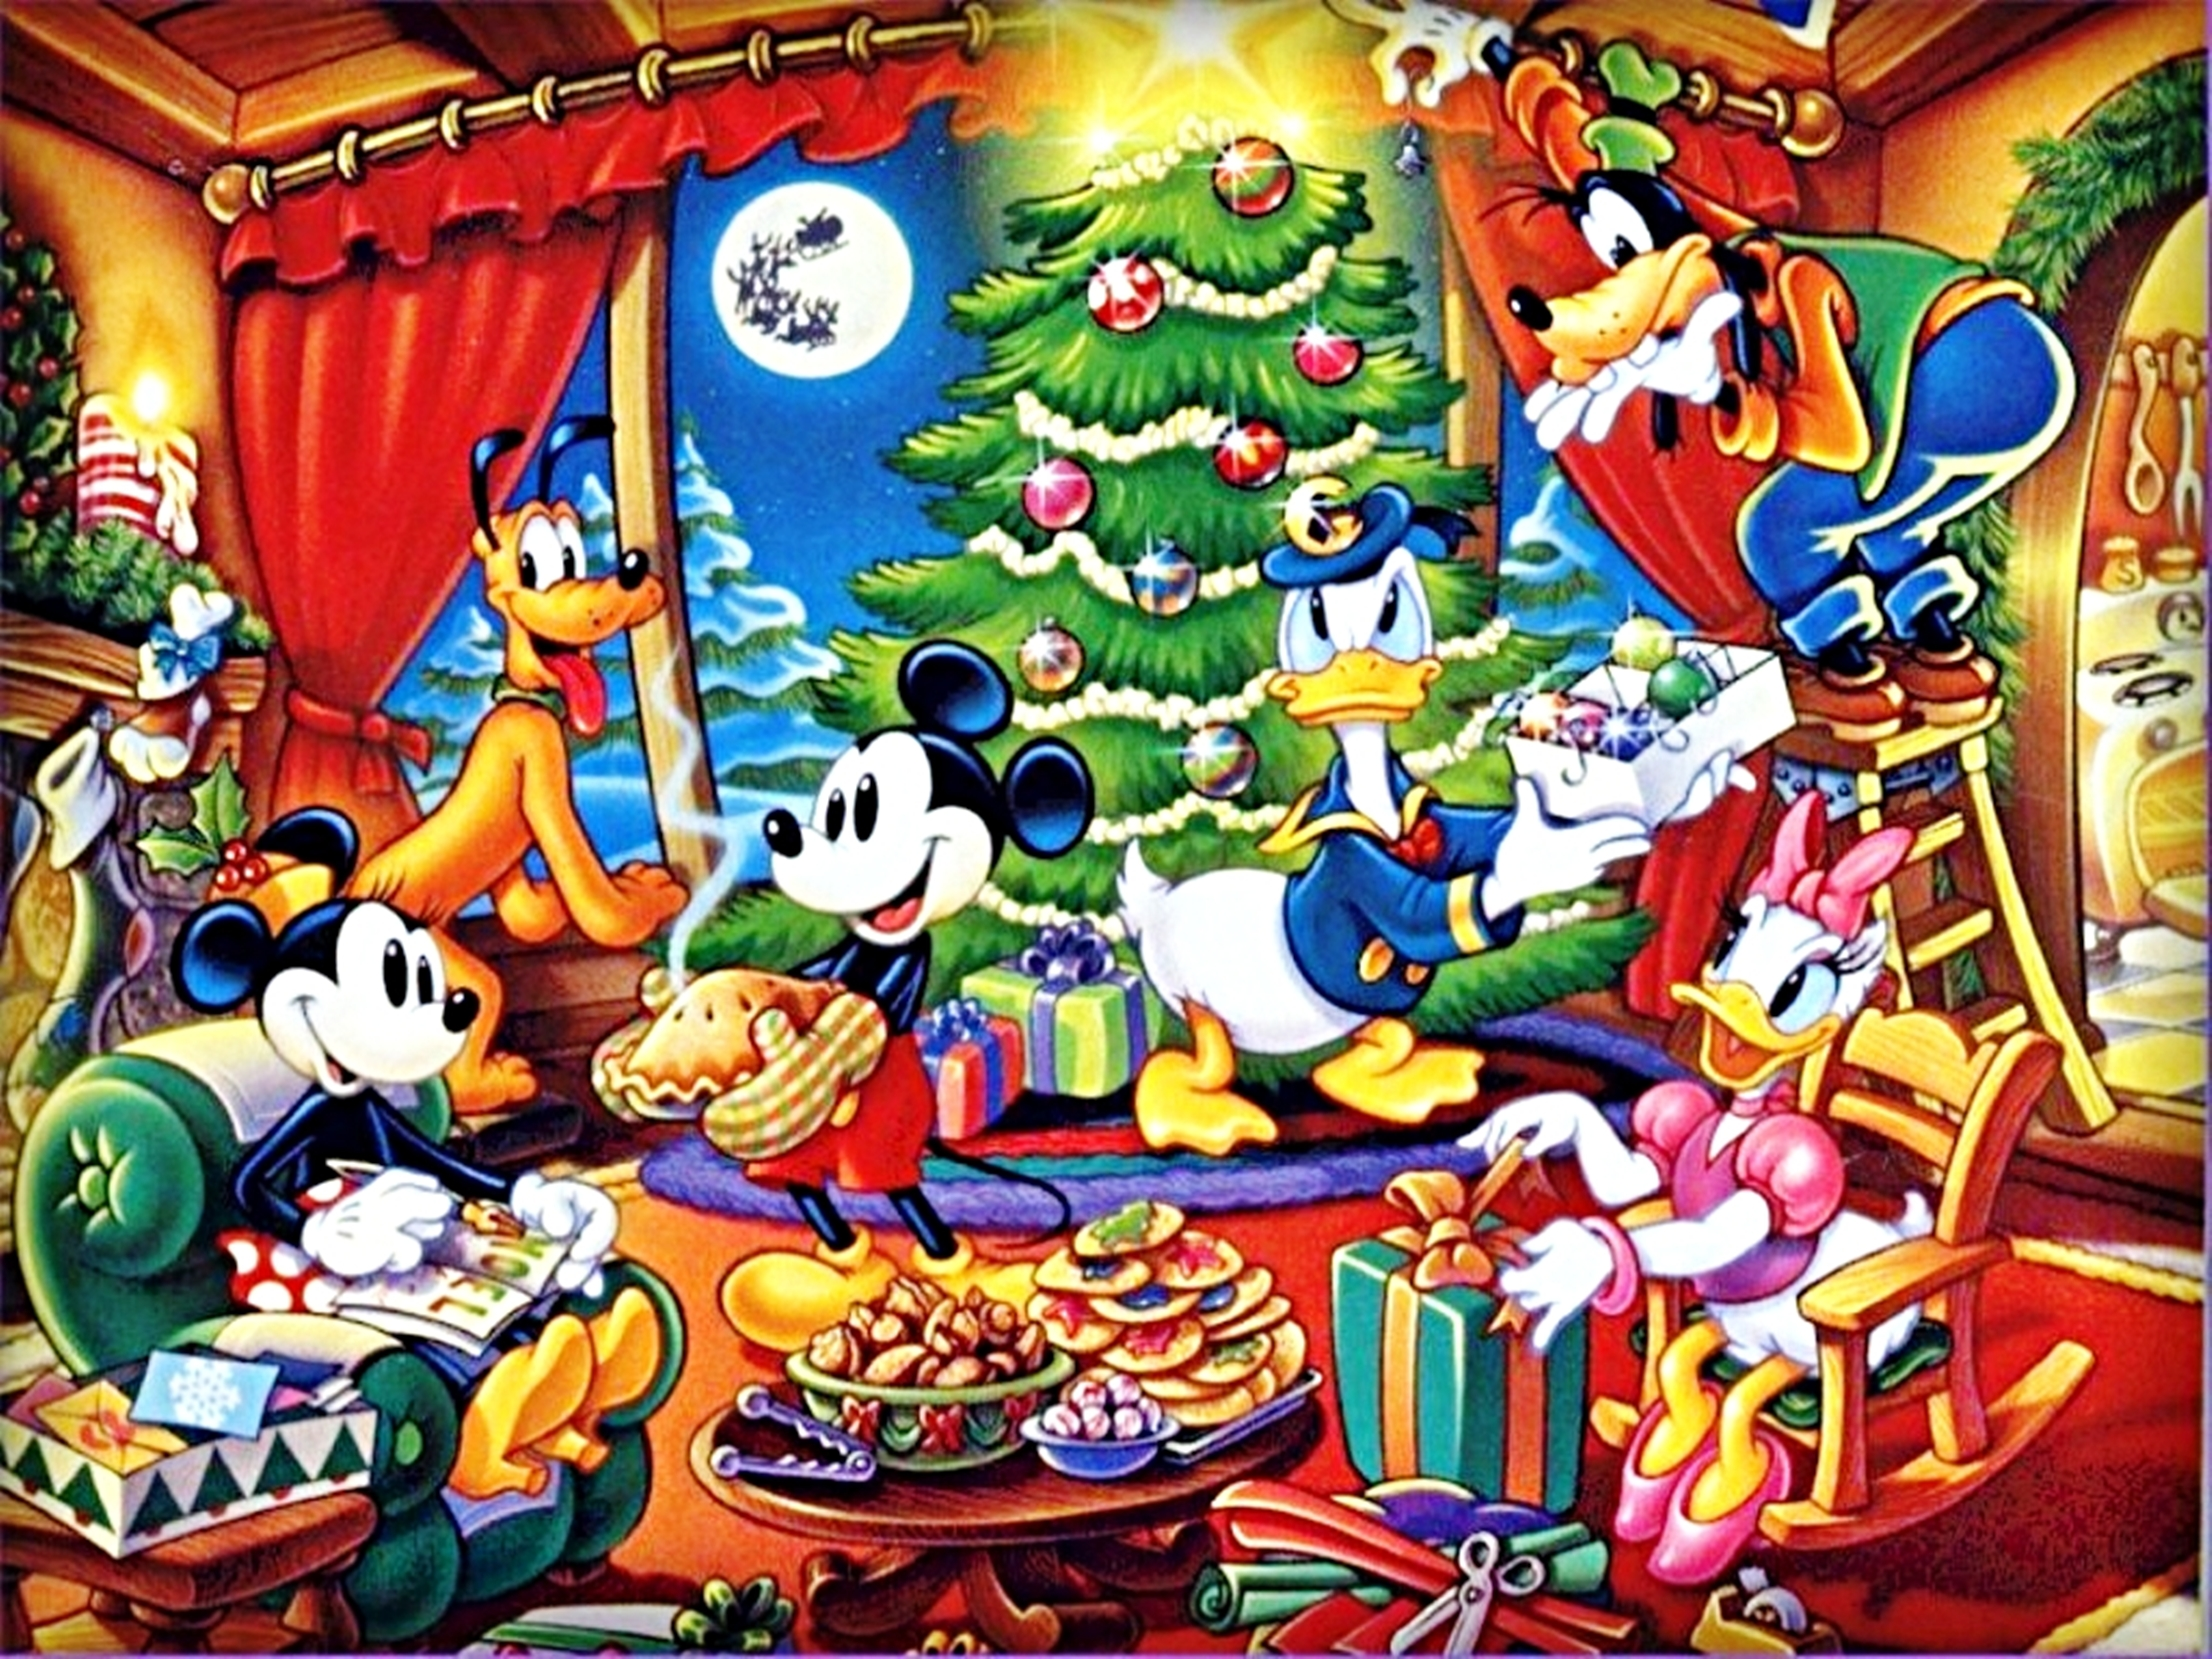 Walt Disney Wallpapers The Disney Gang Christmas walt disney 2212x1659